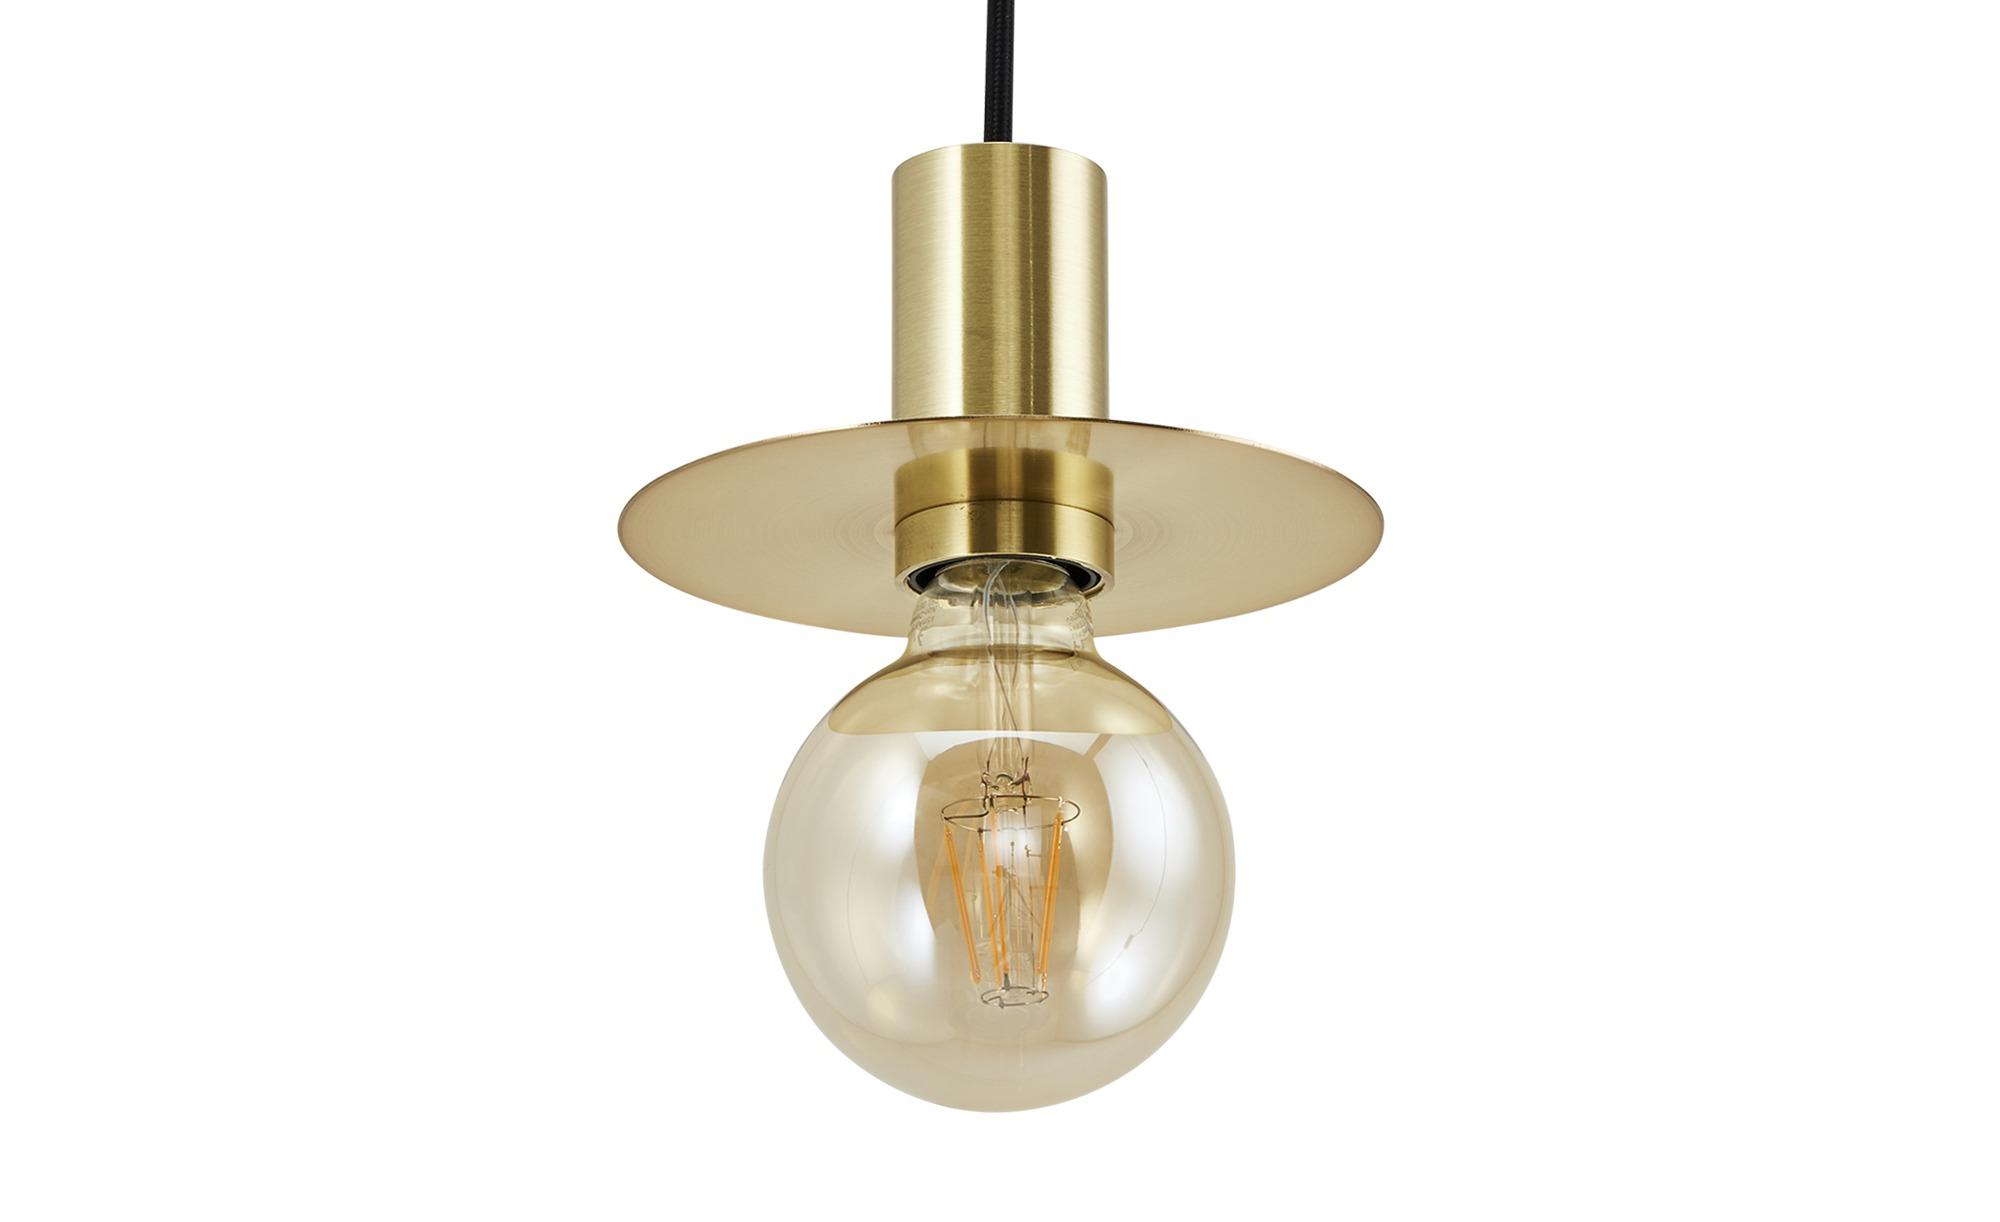 Pendelleuchte, 1-flammig, messing-matt ¦ gold ¦ Maße (cm): H: 143 Ø: 10 Lampen & Leuchten > Innenleuchten > Pendelleuchten - Höffner